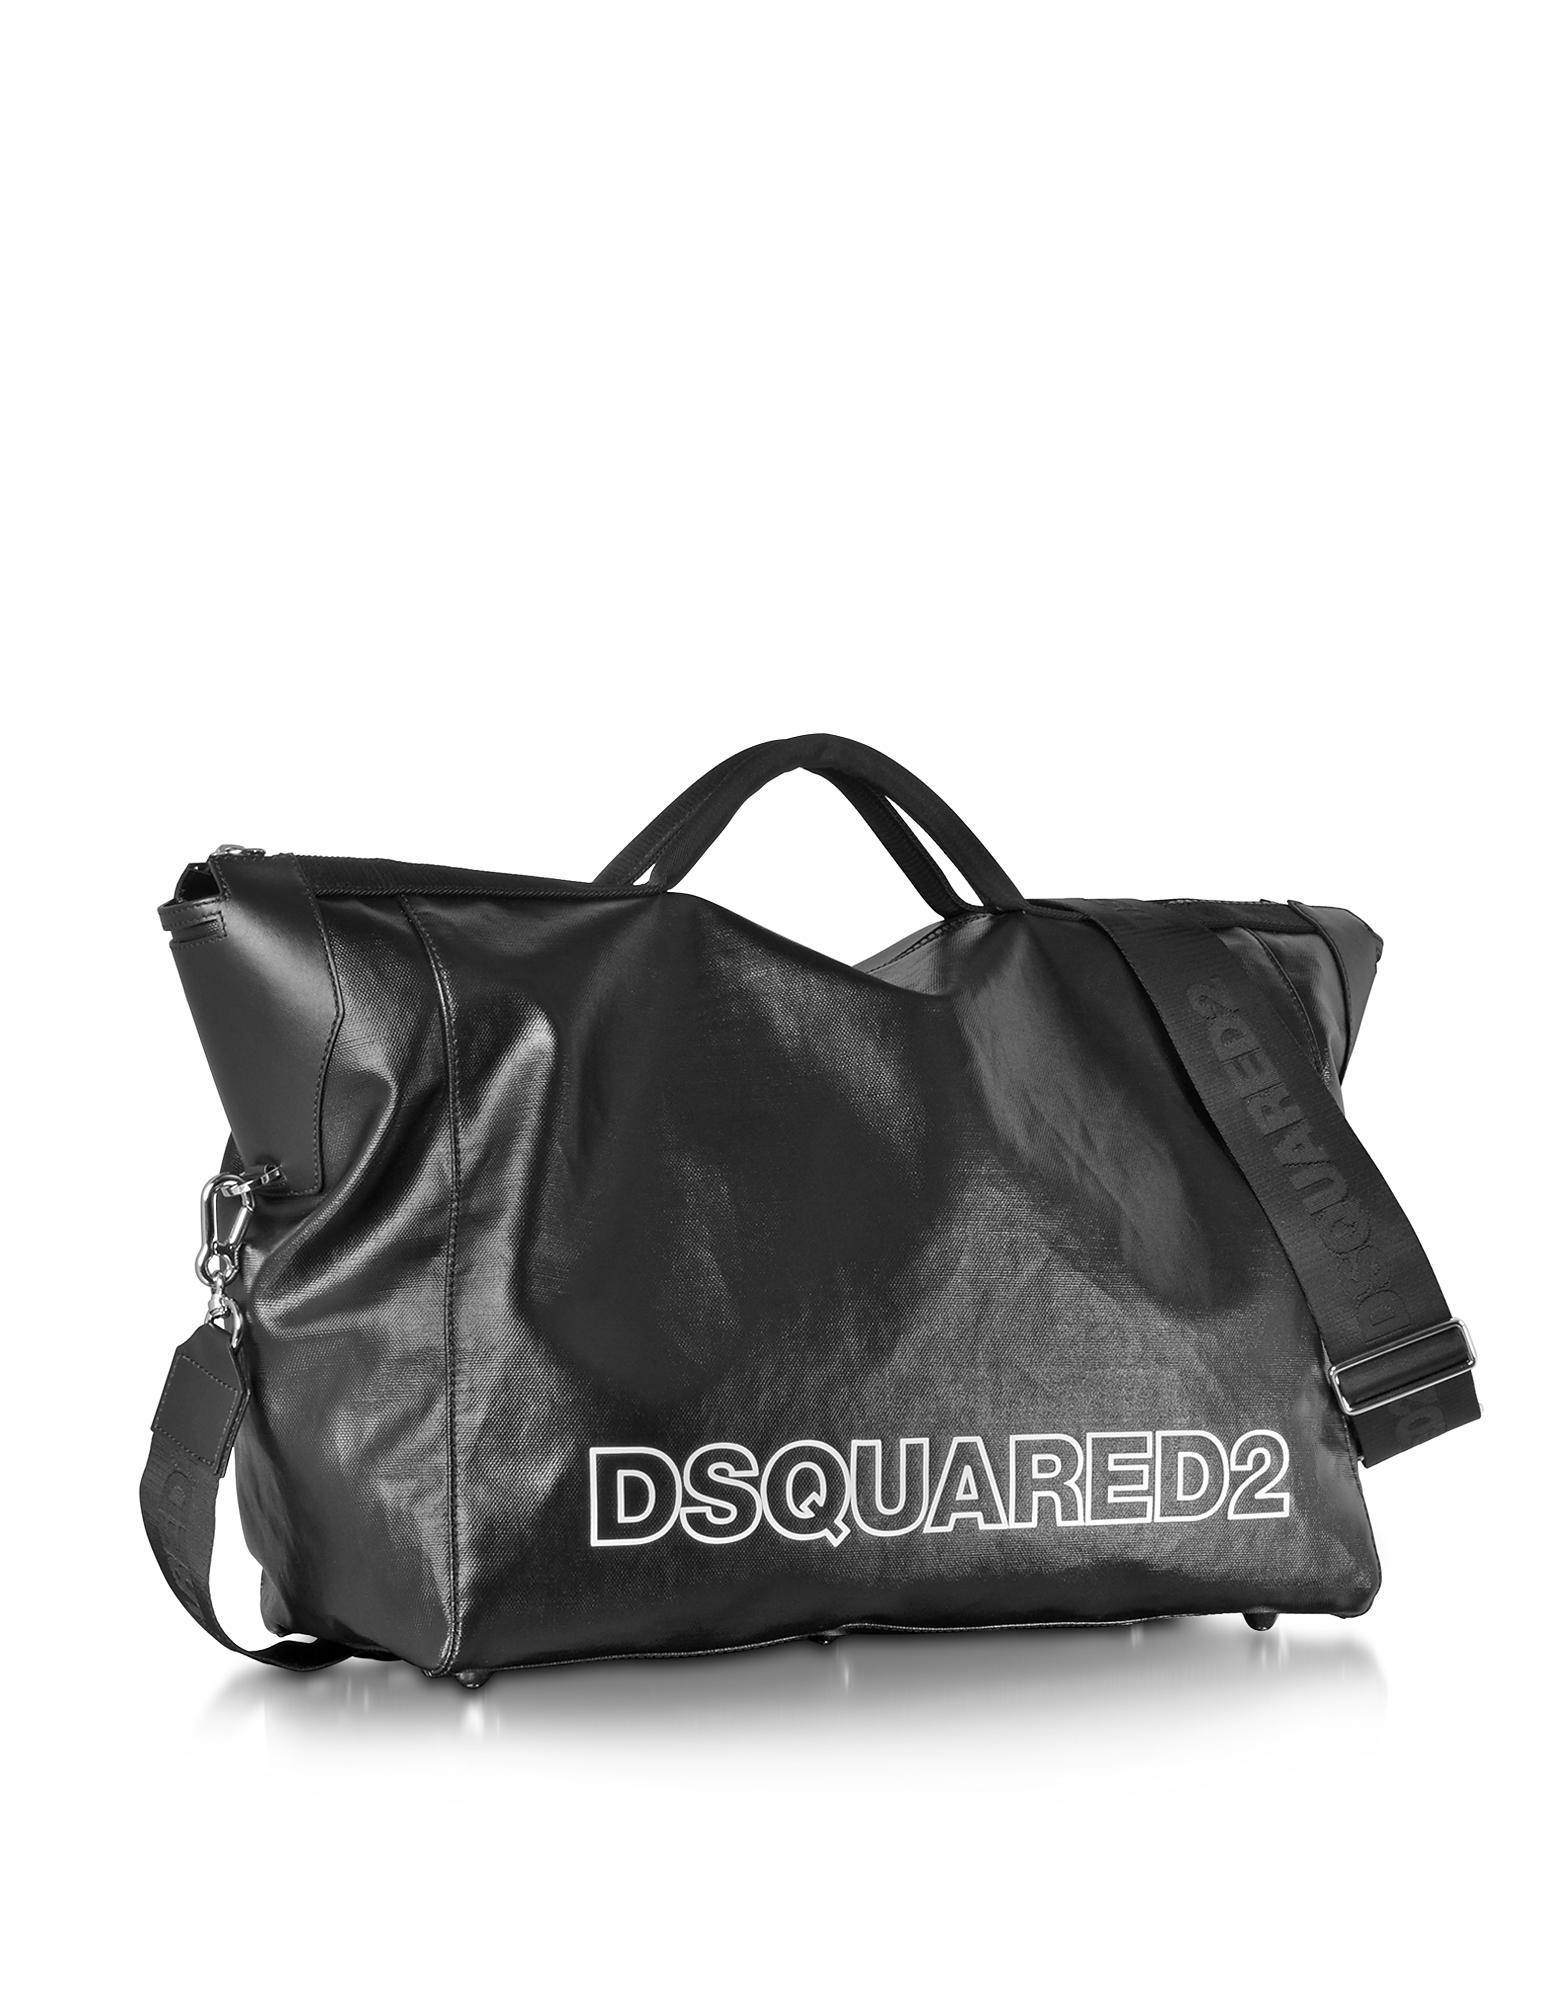 b806c5307011 DSquared² Oversized Black Leather Duffle Bag in Black for Men - Lyst